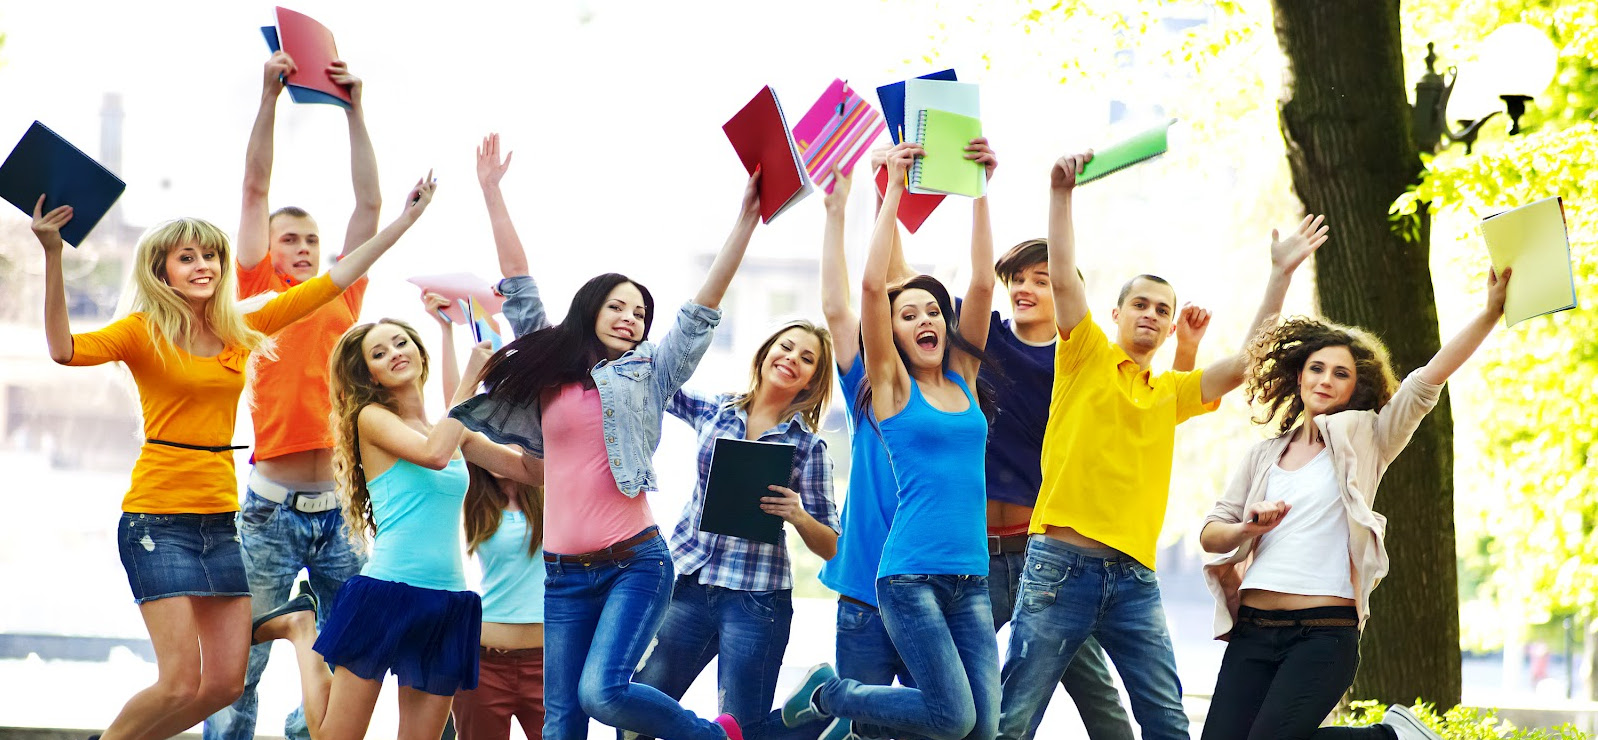 Jumping_students1.jpg